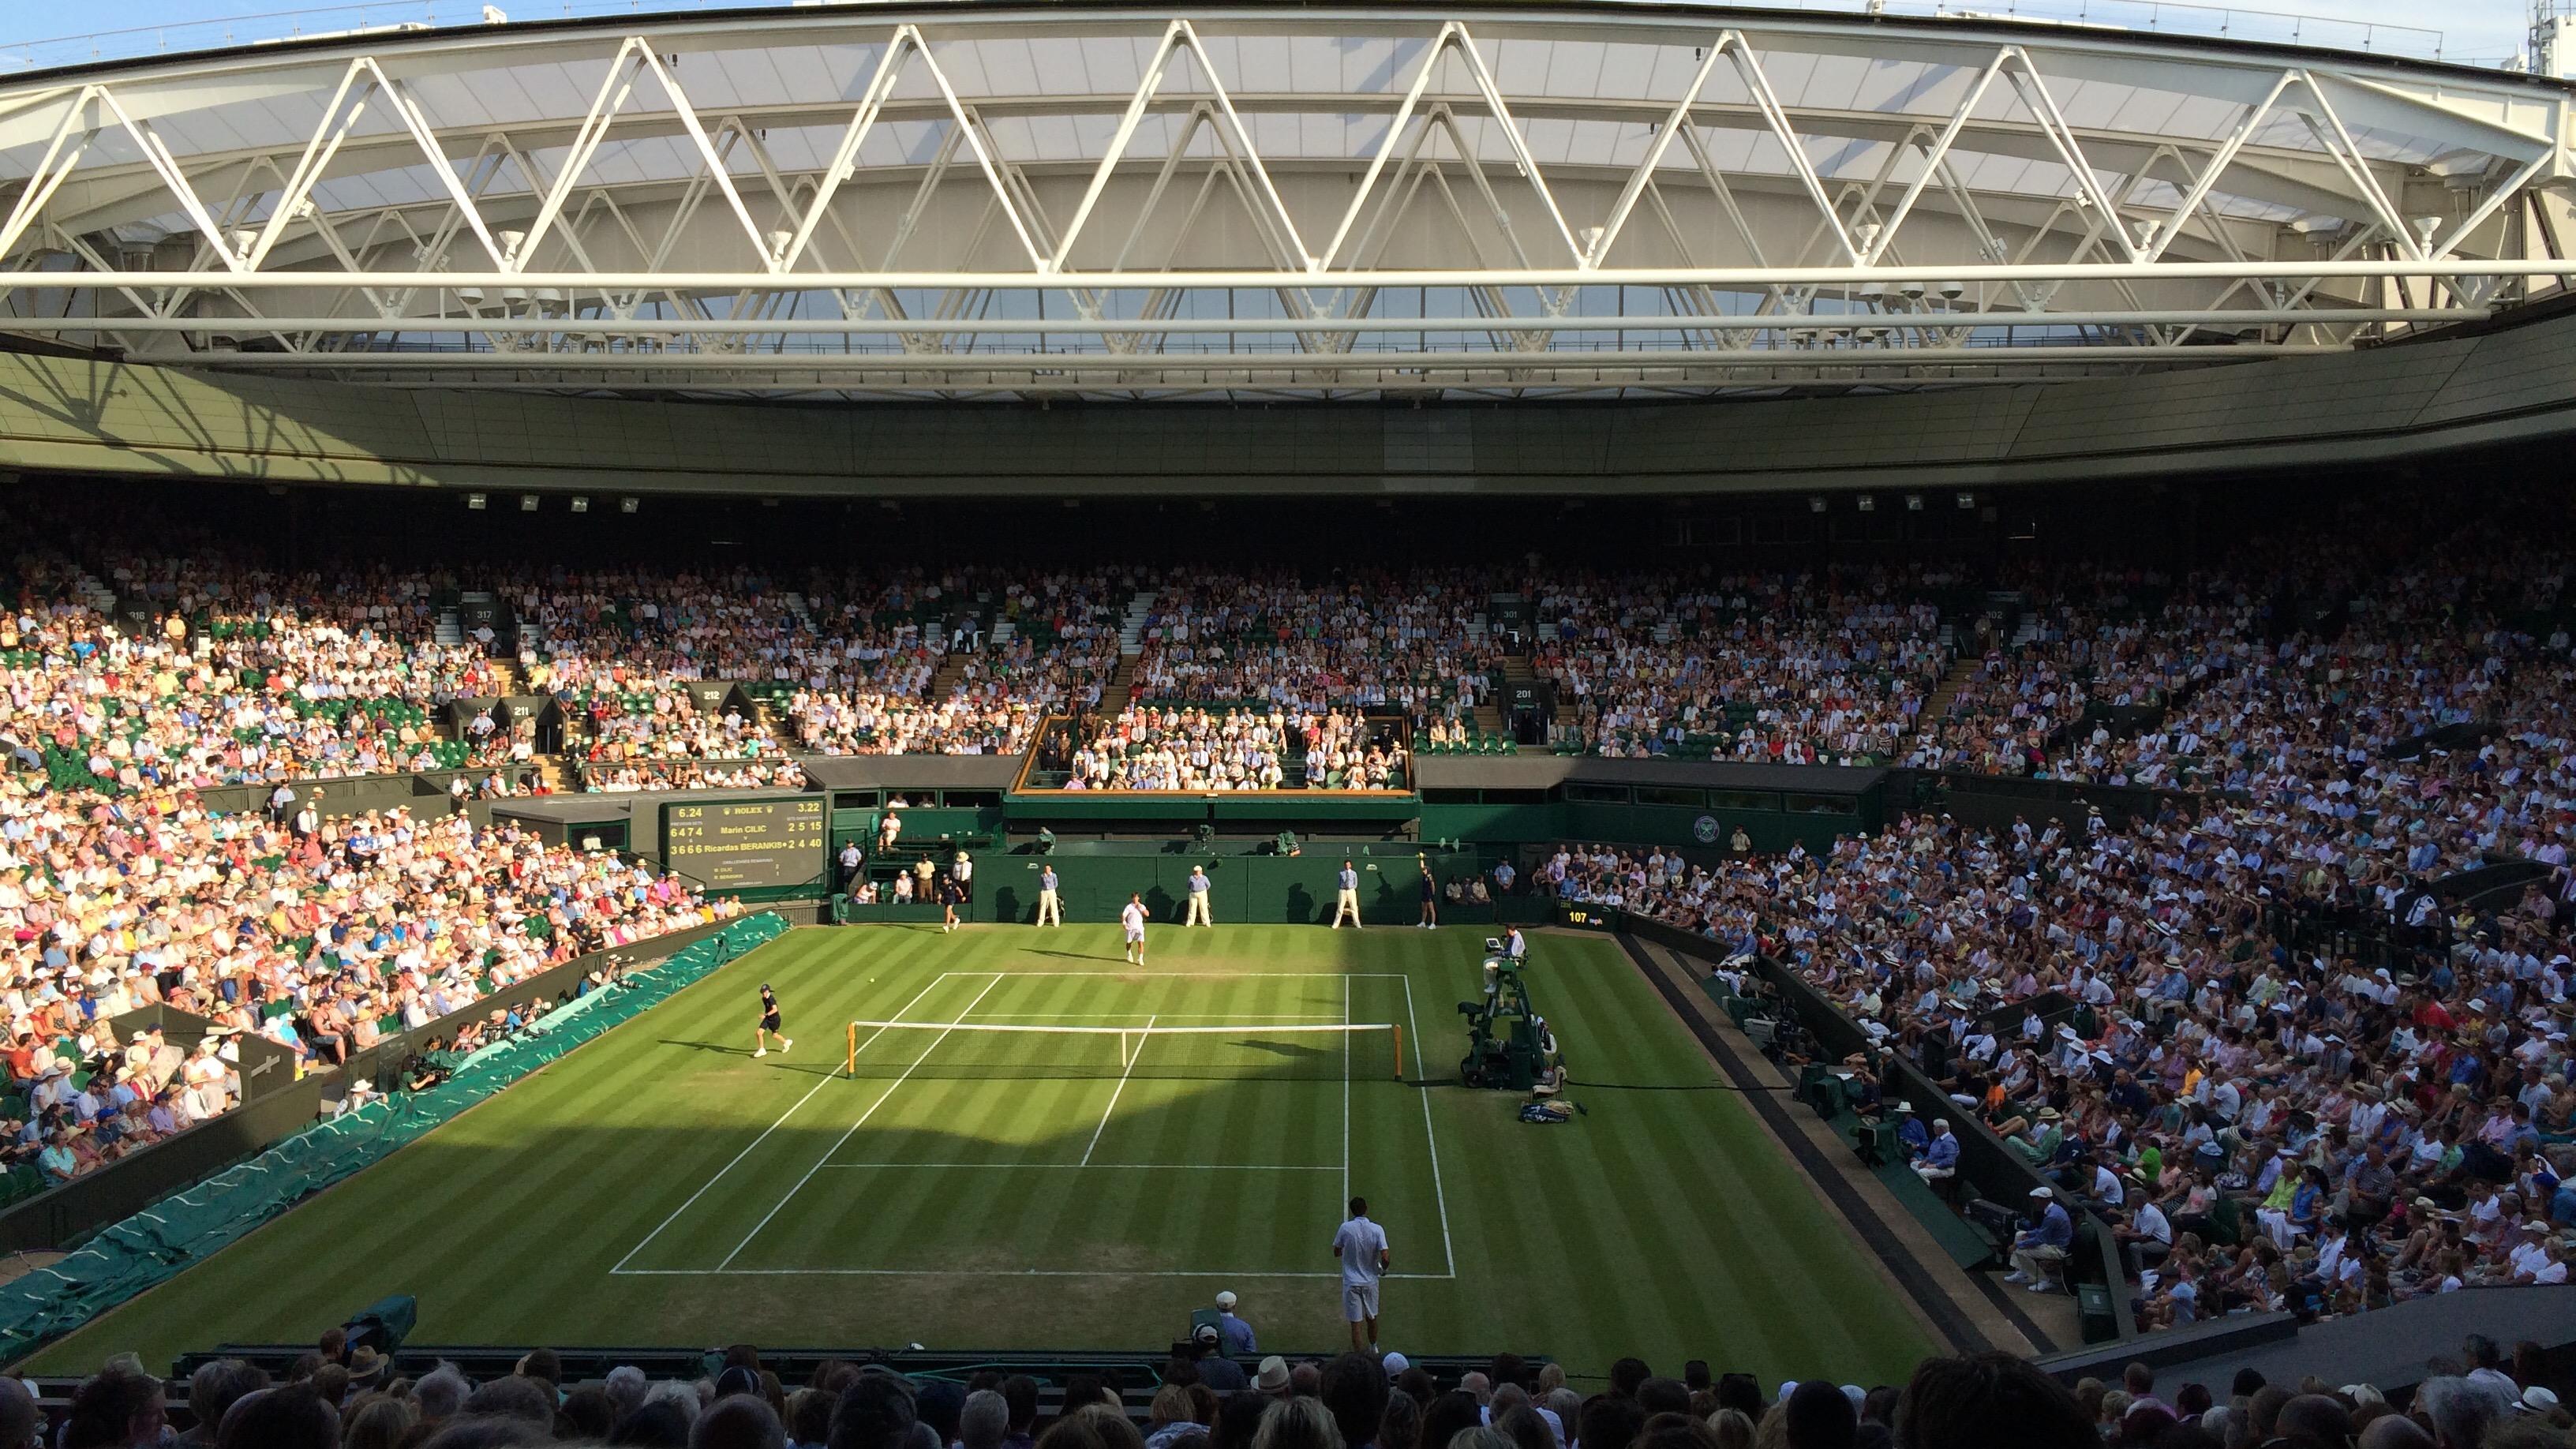 RolandGarros vs Wimbledon divise Lavazza